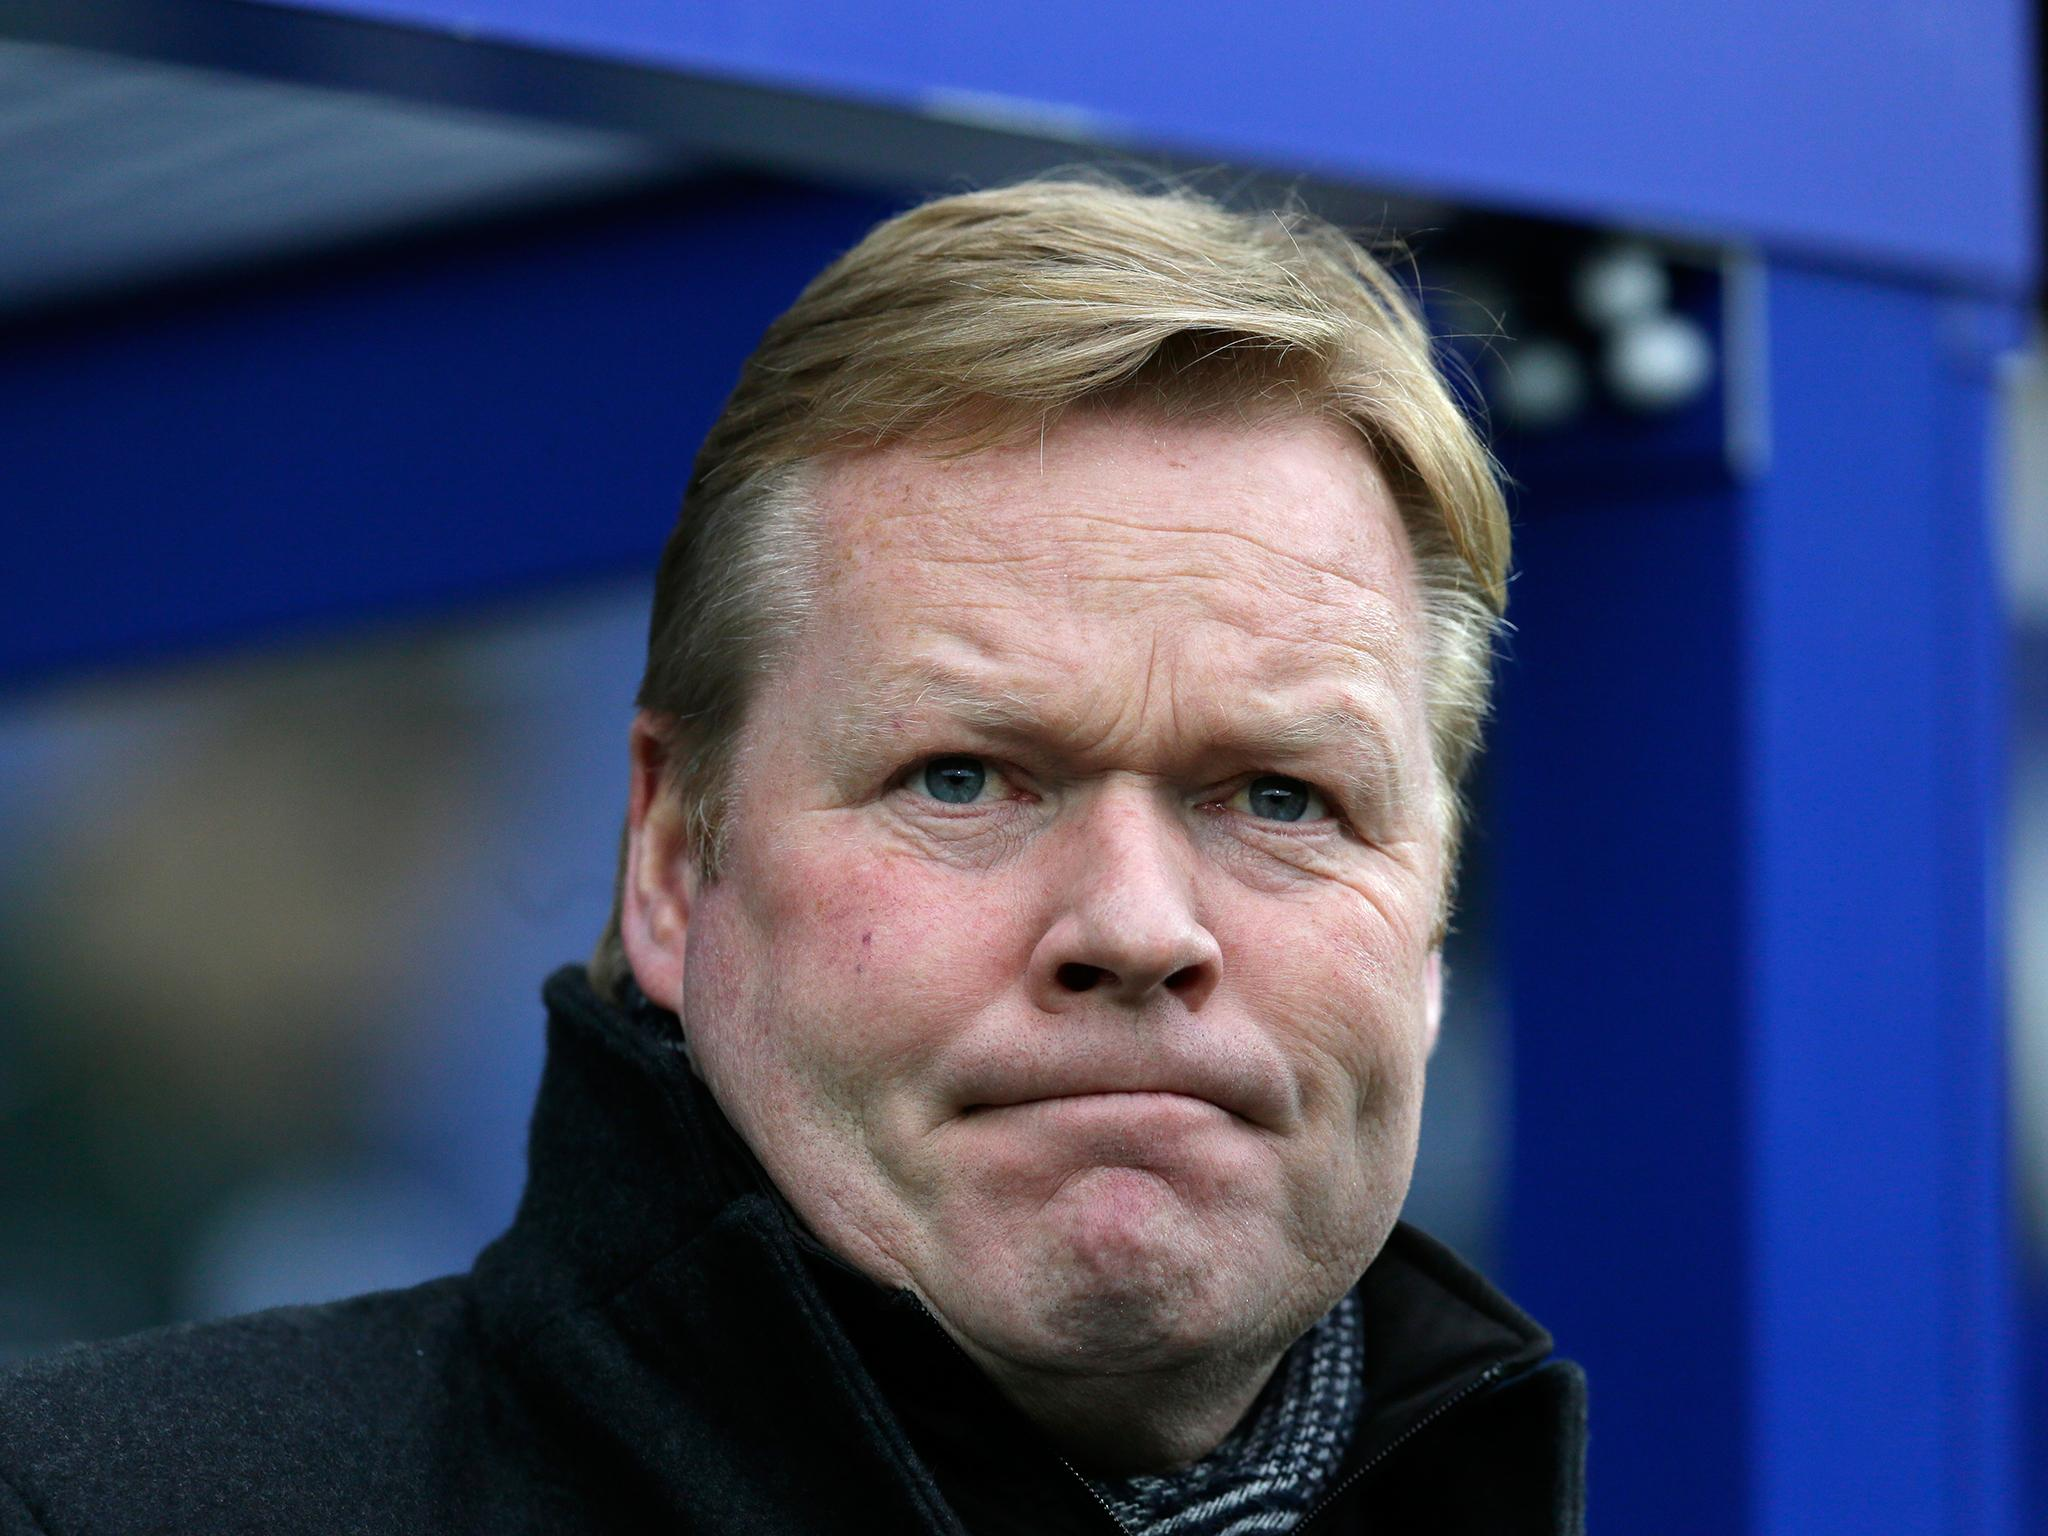 Ronald Koeman has been sacked by Everton